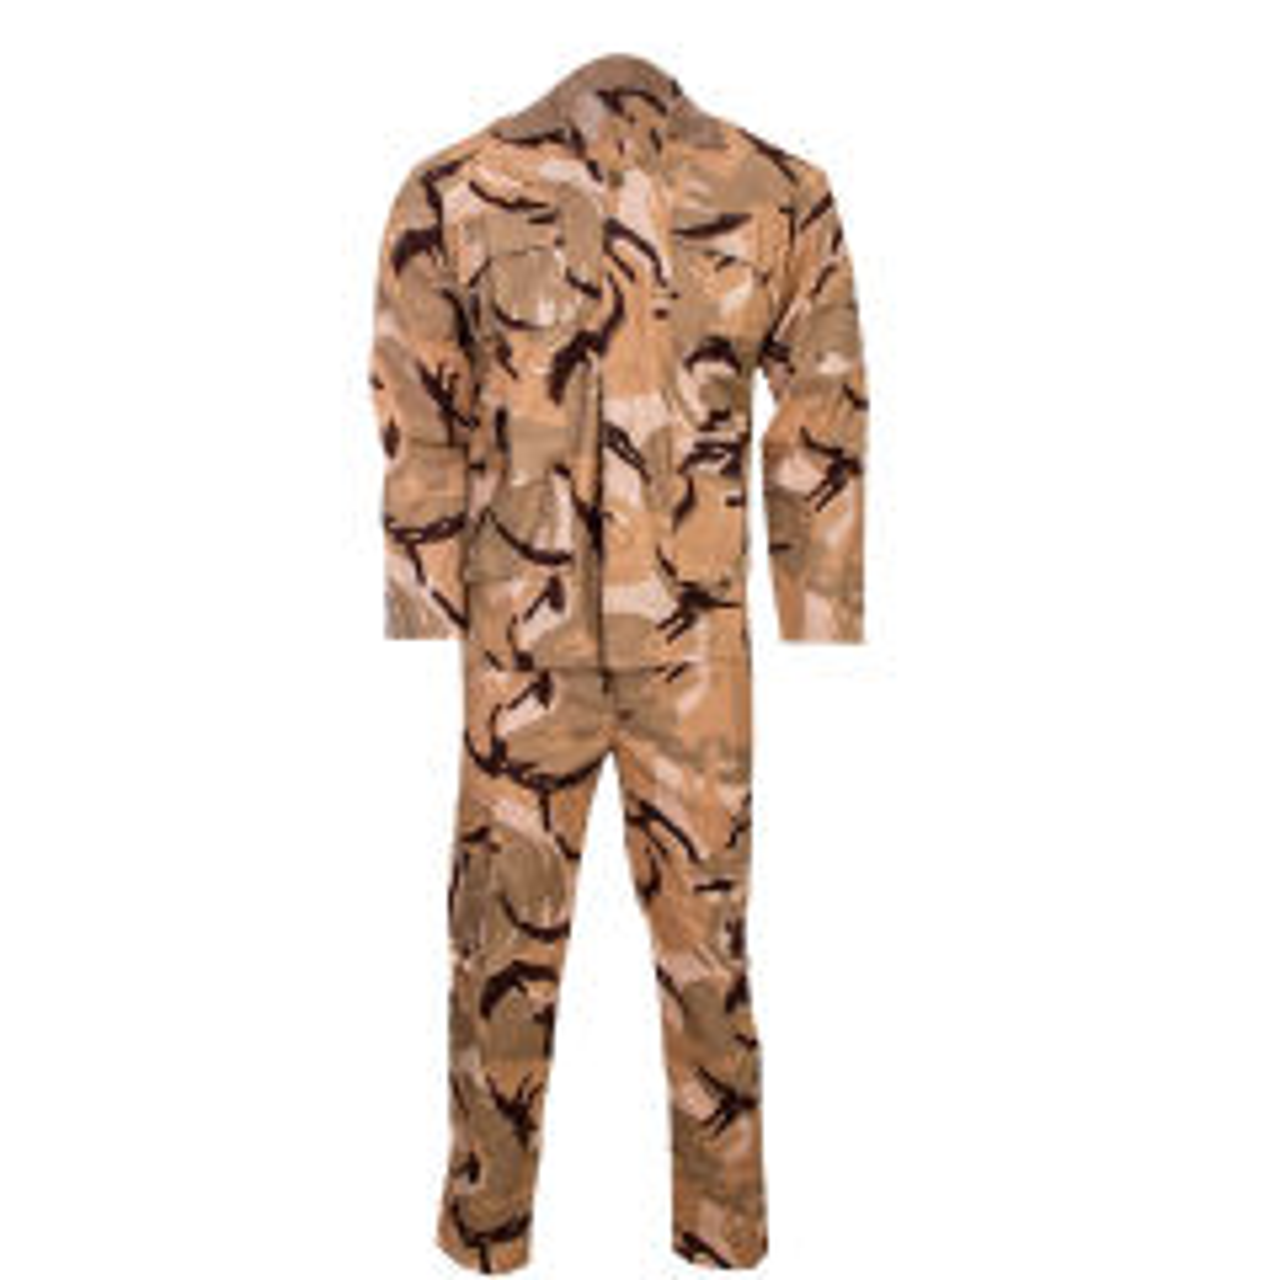 لباس کار مدل سربازی